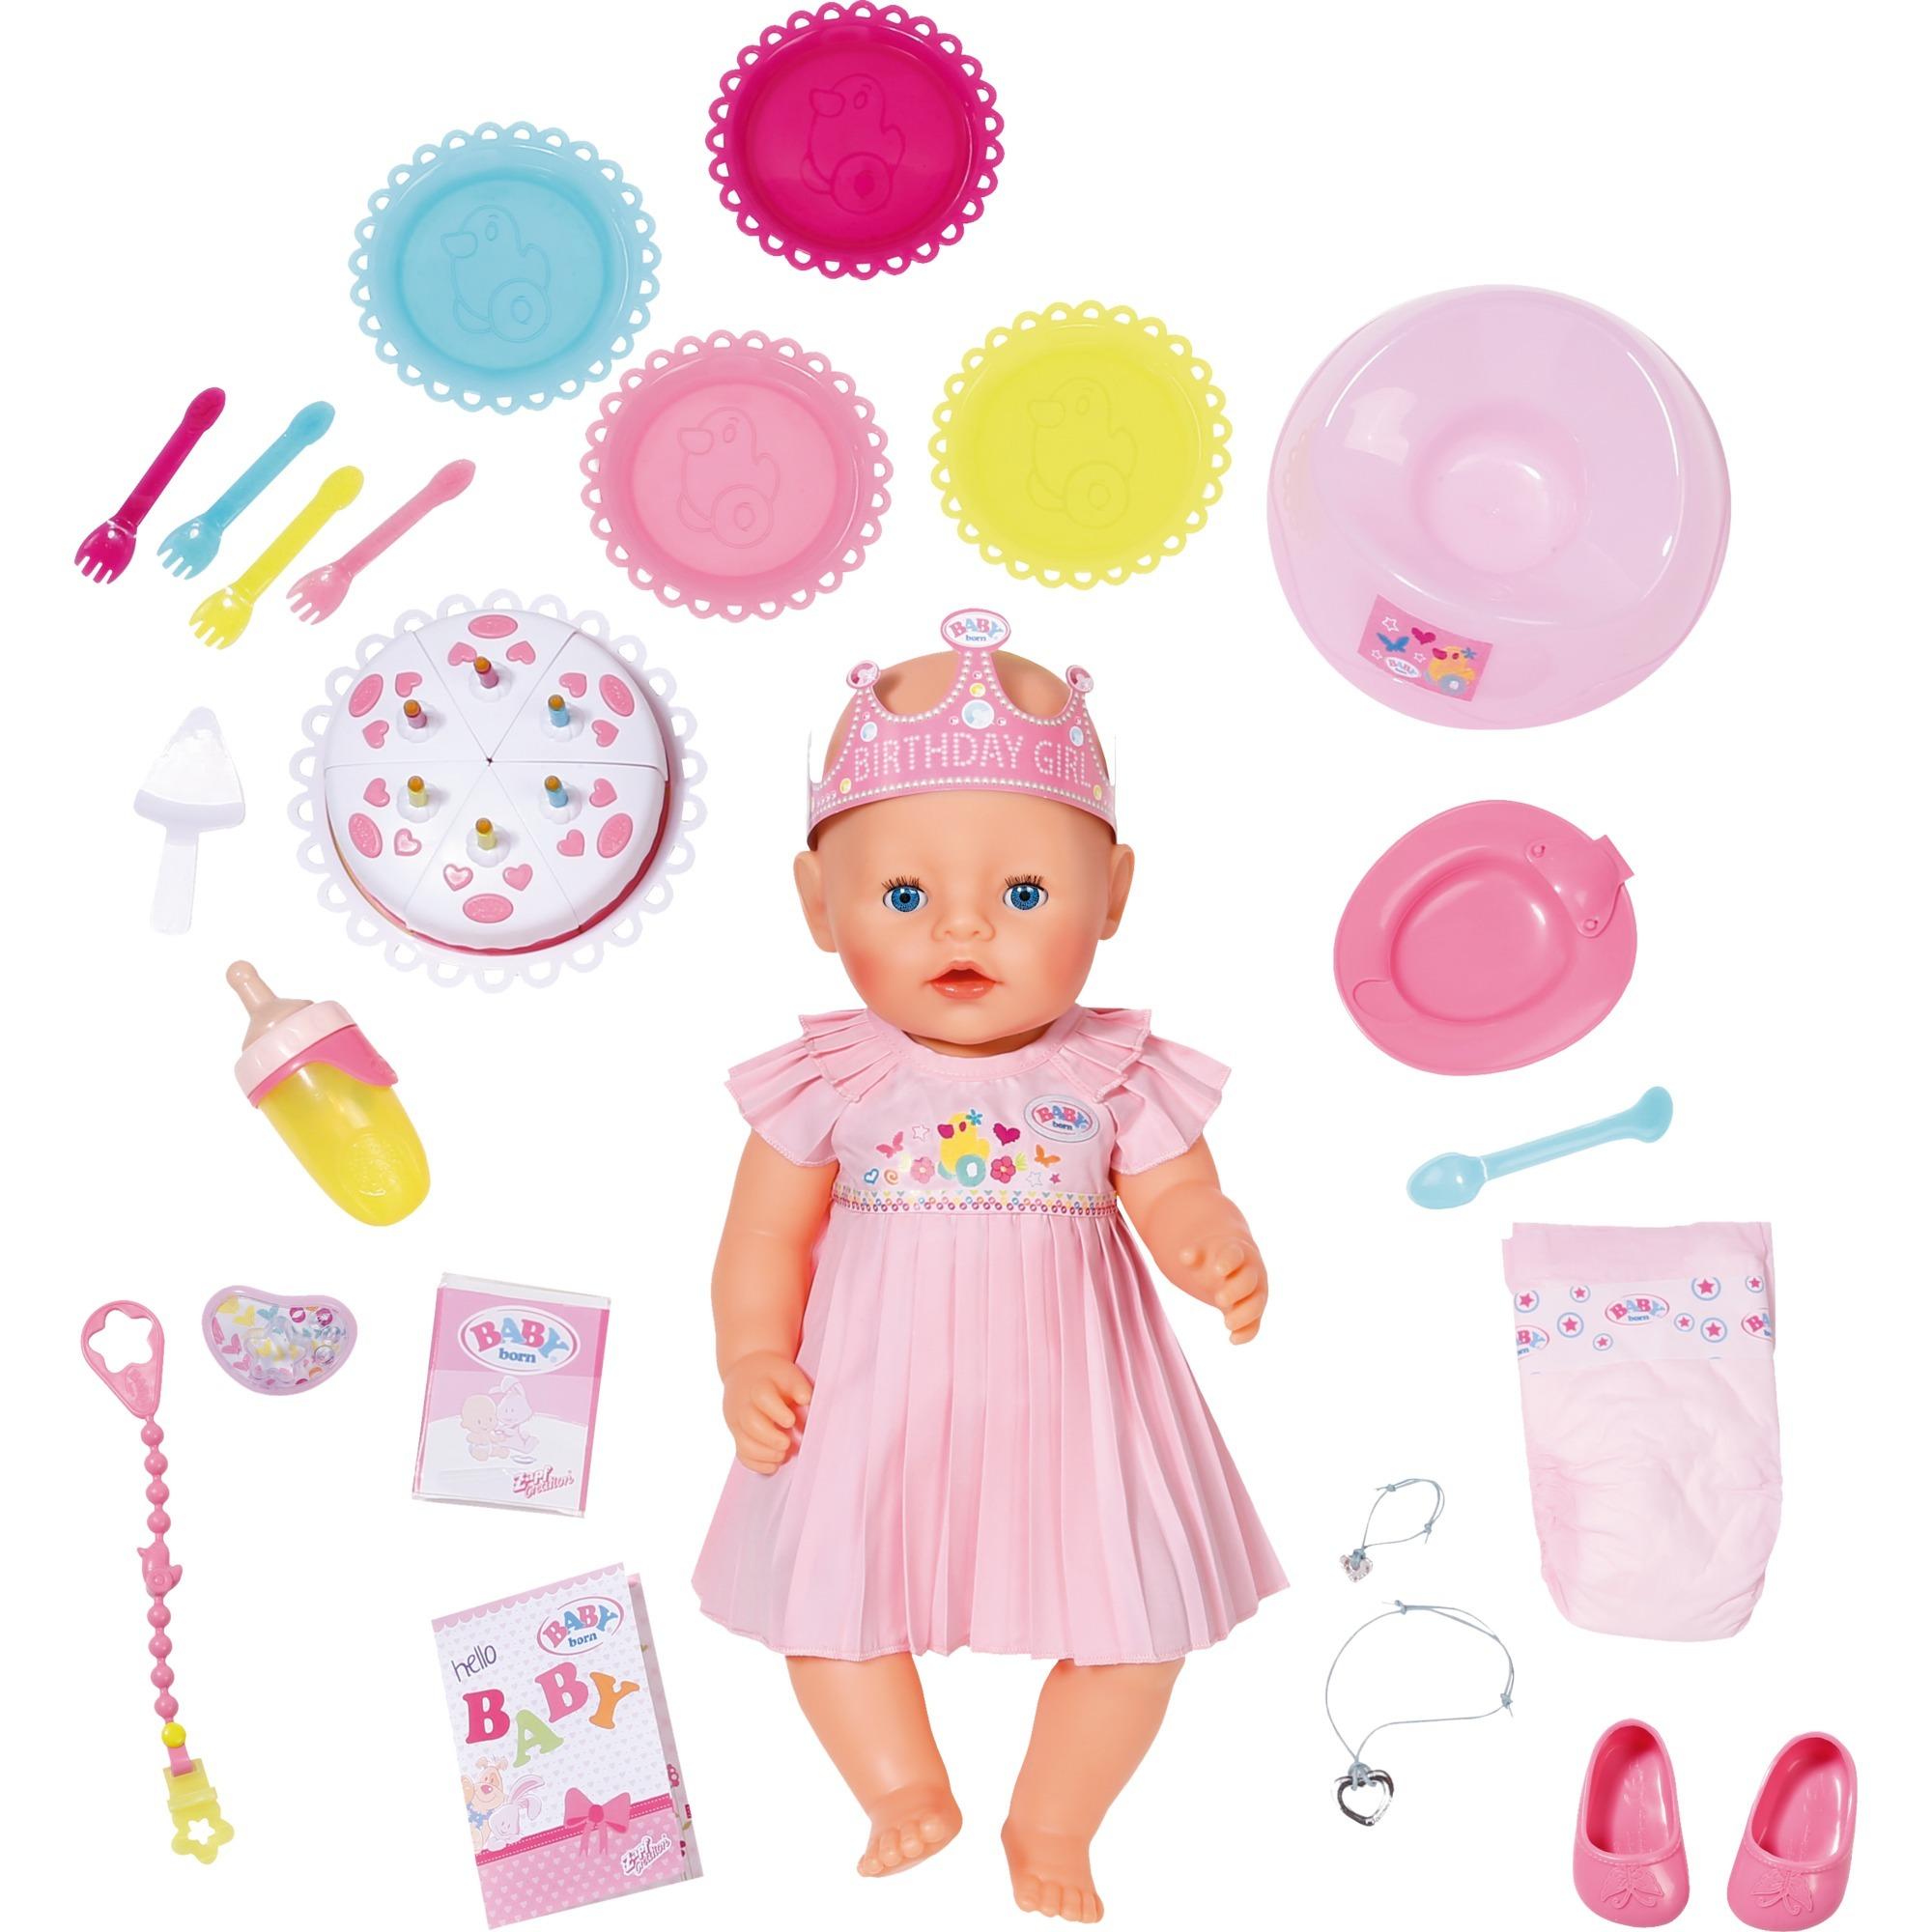 interactive-happy-birthday-dukke-doll-accessories